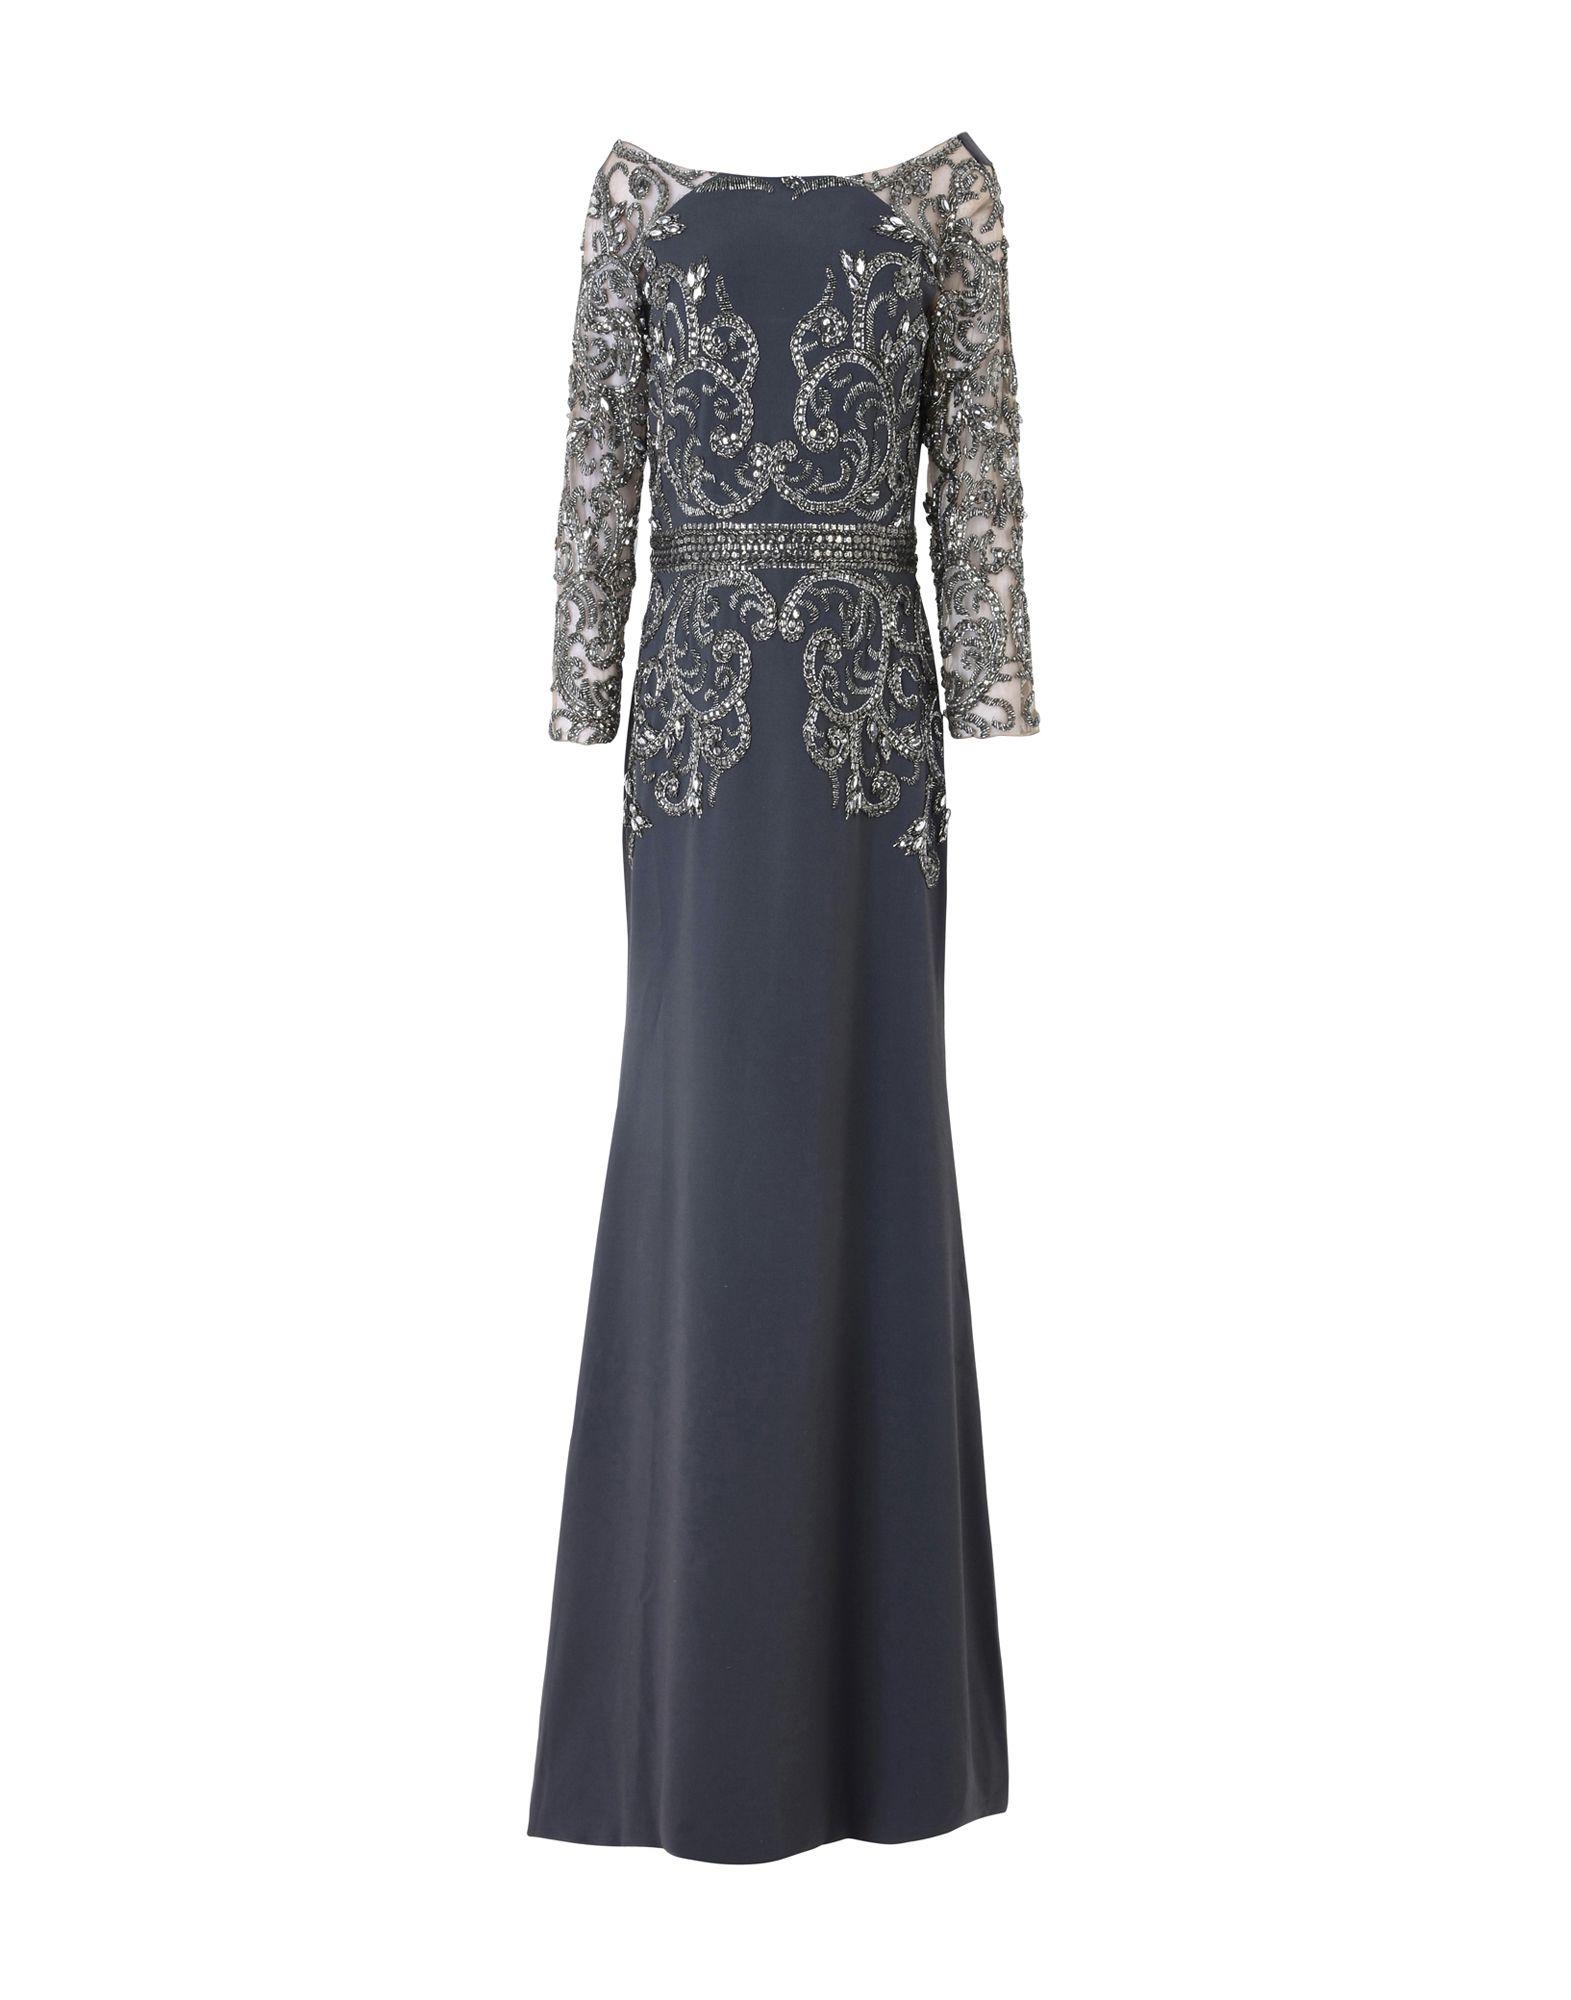 PATRICIA BONALDI Long Dress in Lead